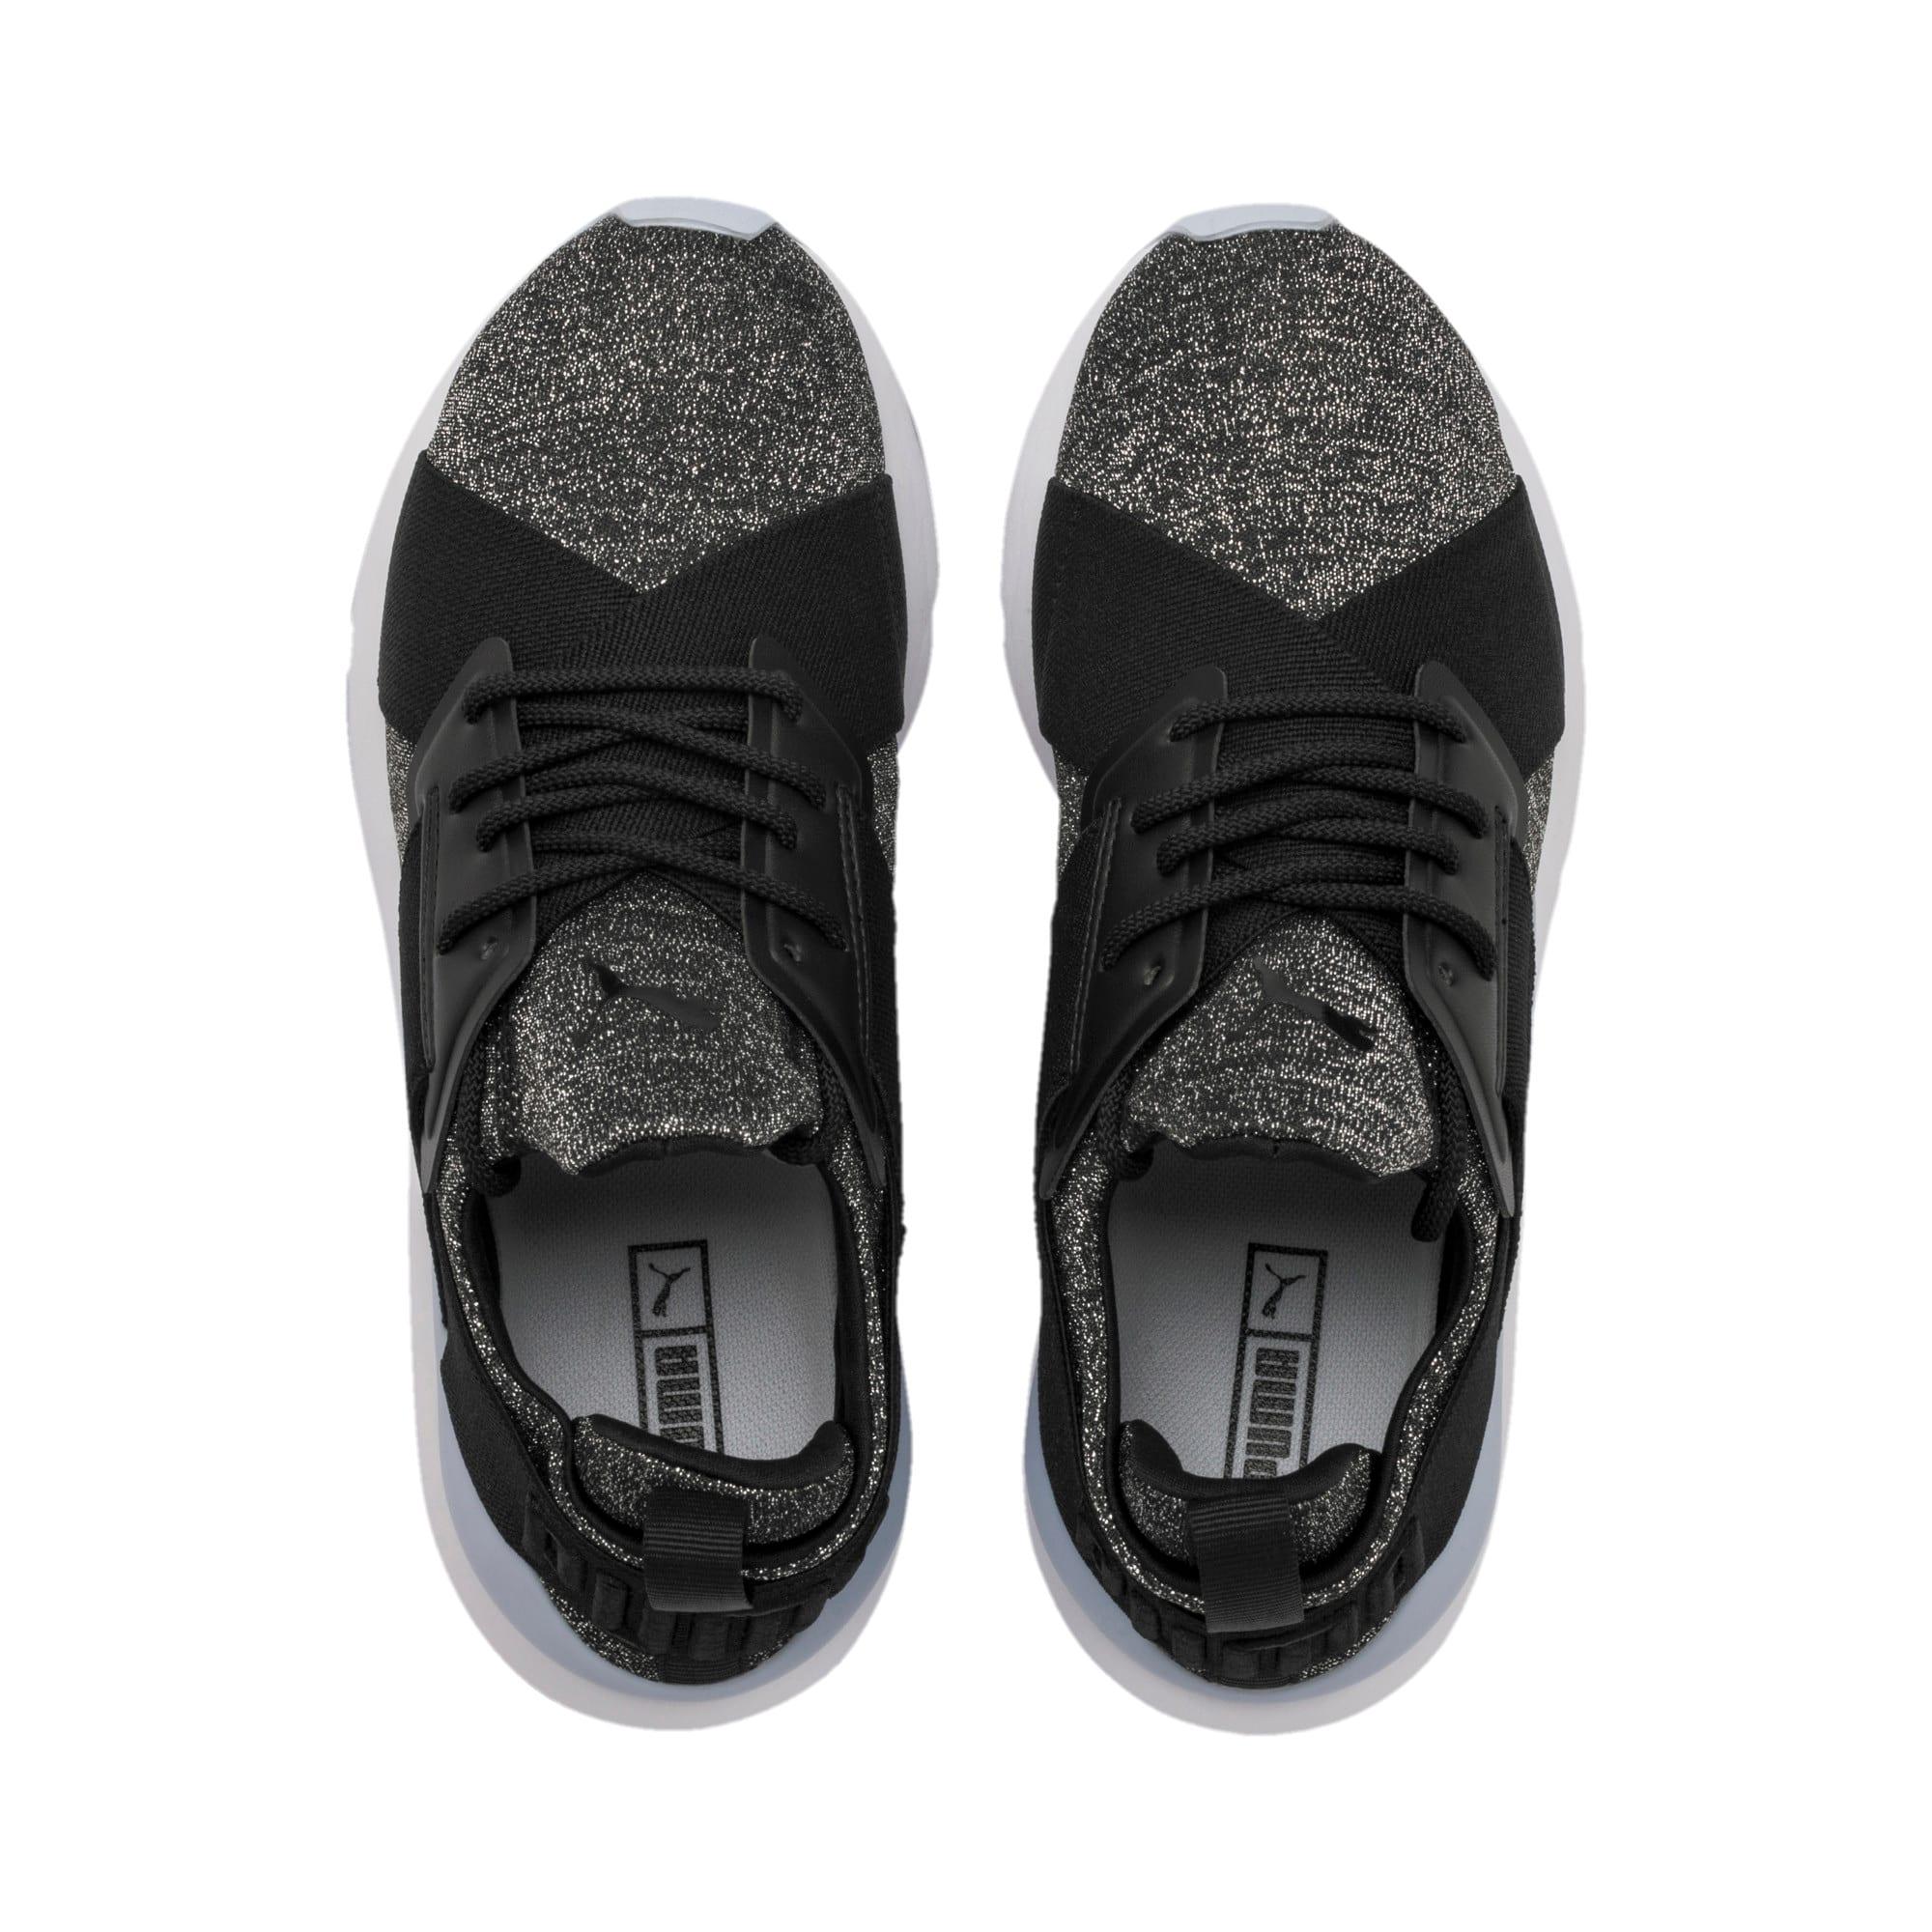 Thumbnail 6 of Muse Shift Sneakers JR, Puma Black-Heather, medium